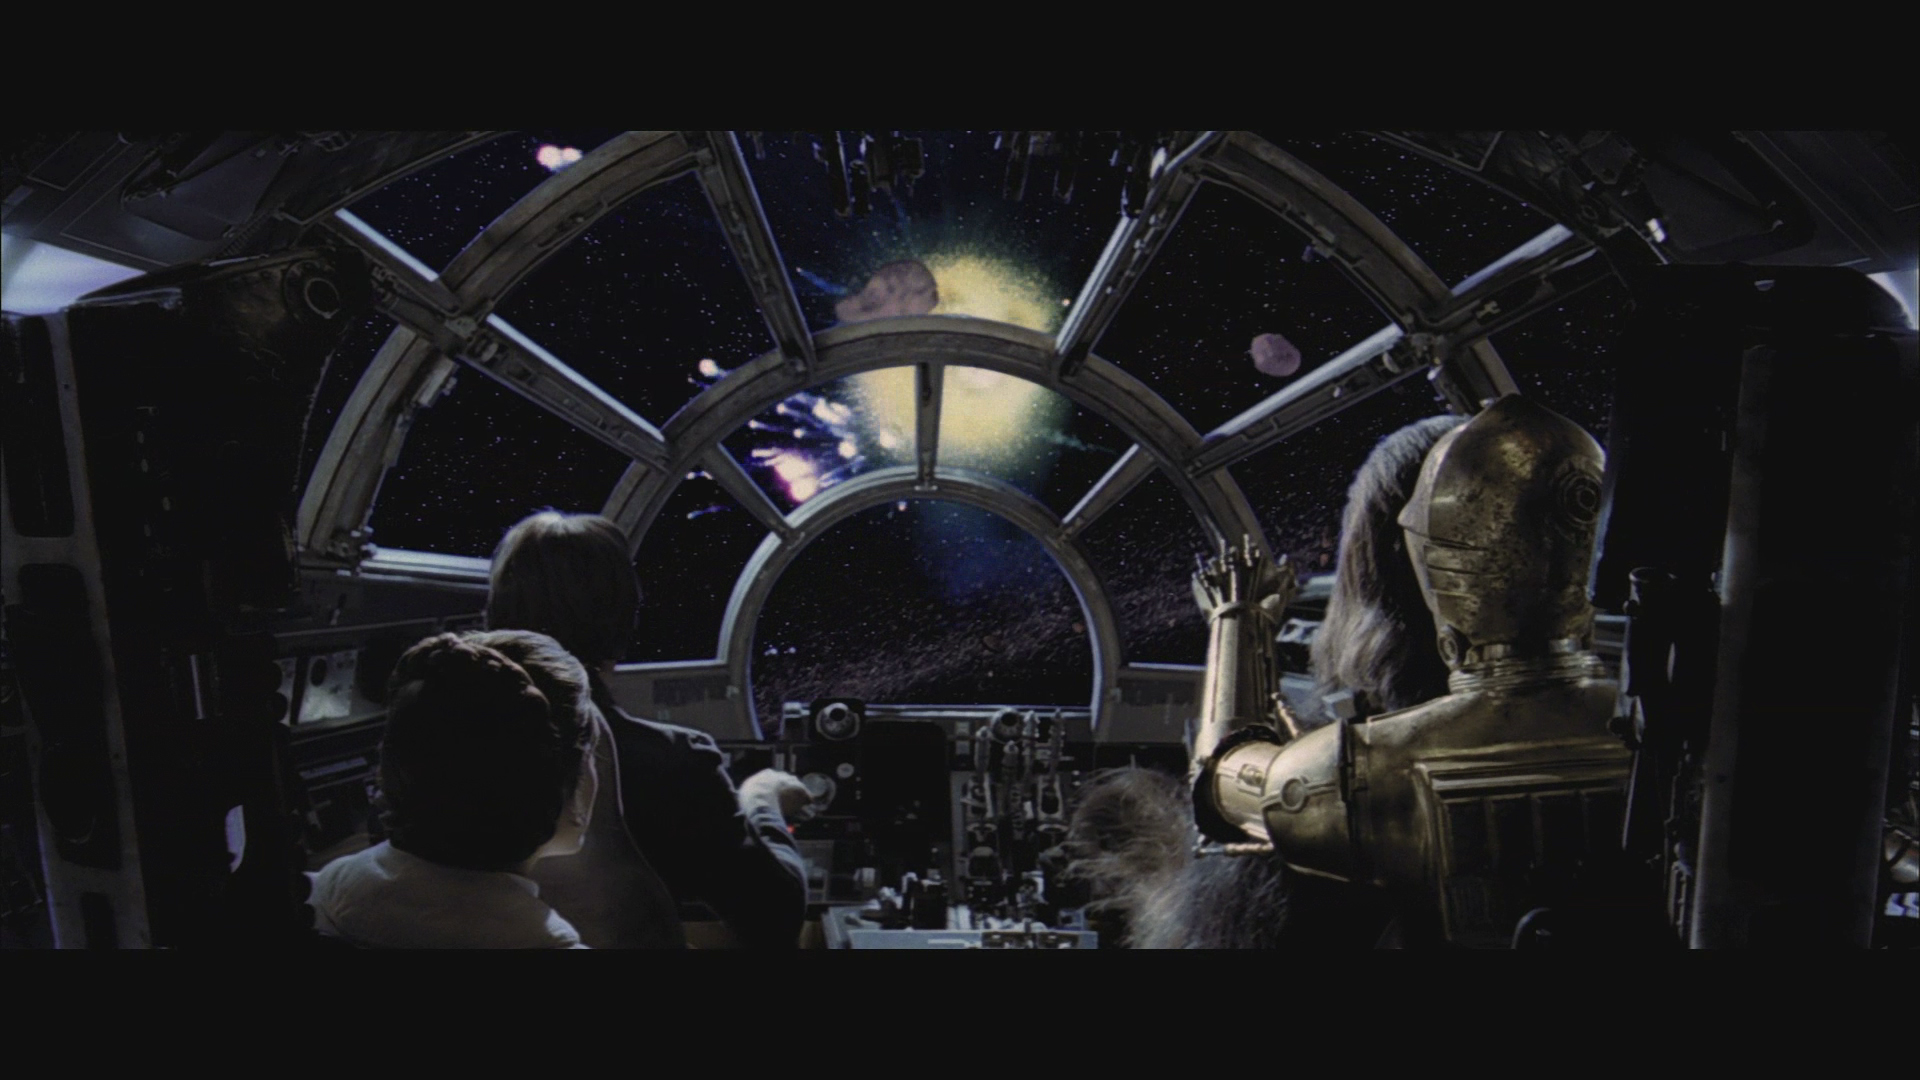 Displaying images for millenium falcon cockpit wallpaper - Image Healthhaven Com 300 Ca_la_han Htm